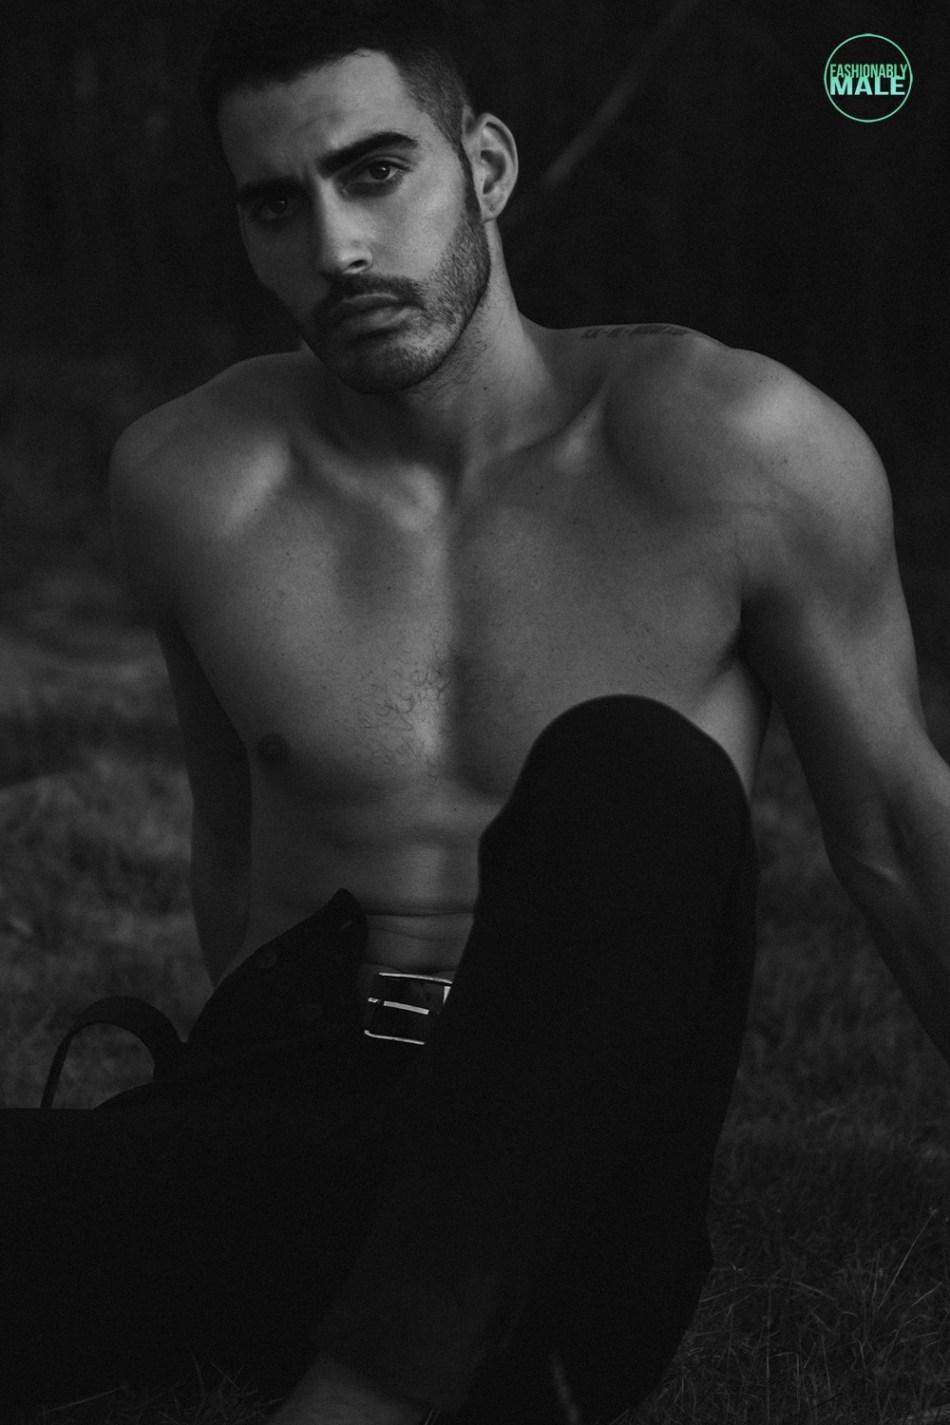 Chen Jerbi by Eran Levi for Fashionably Male6